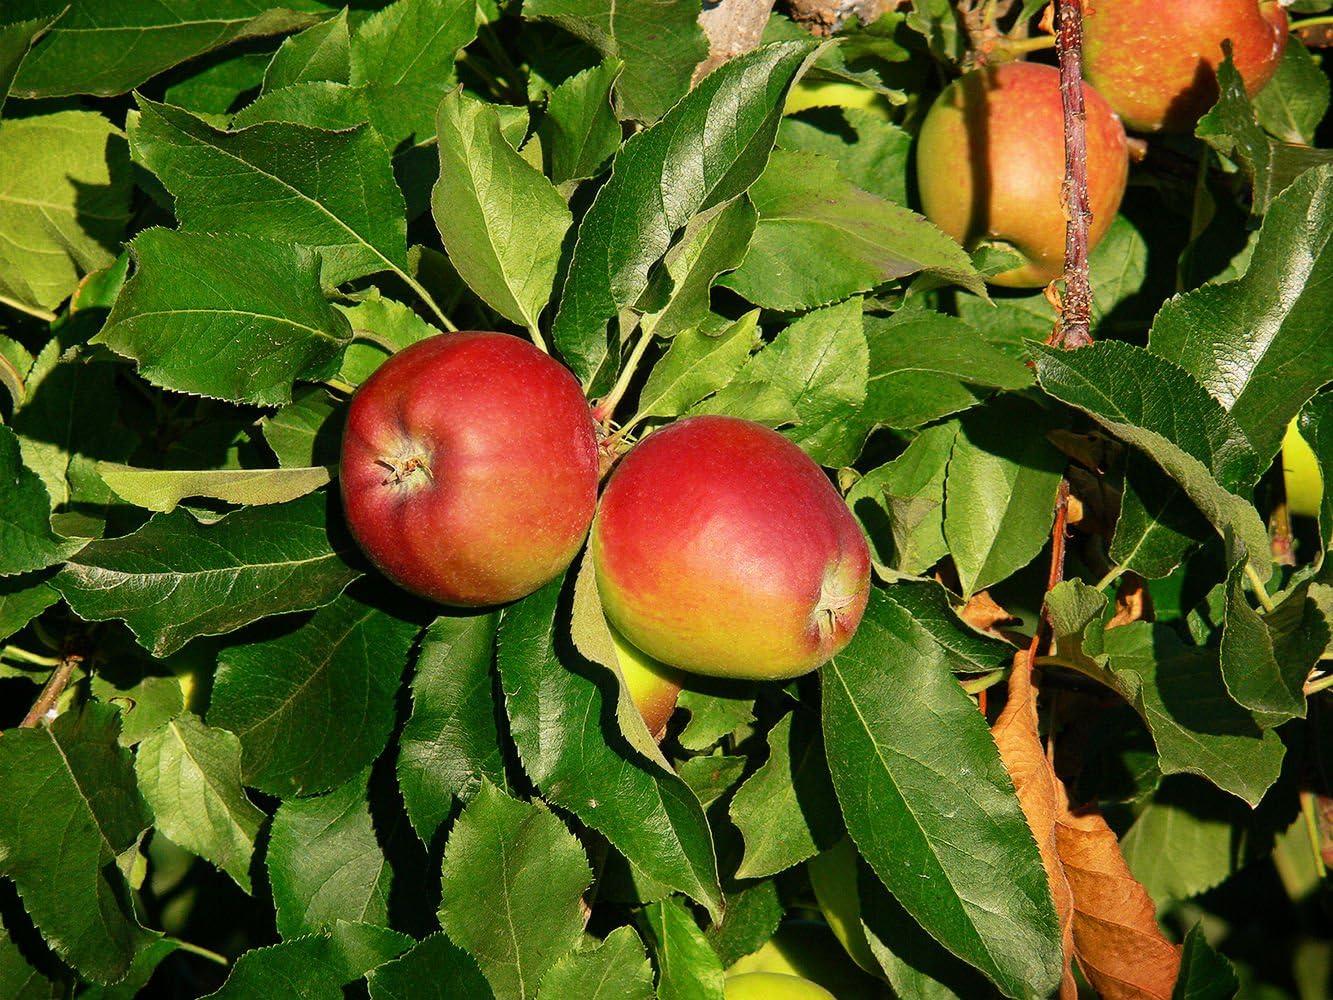 owzoneplant 1 Each 1 Gallon Trade Pot Gala Apple Tree Semi-Dwarf - Healthy Established